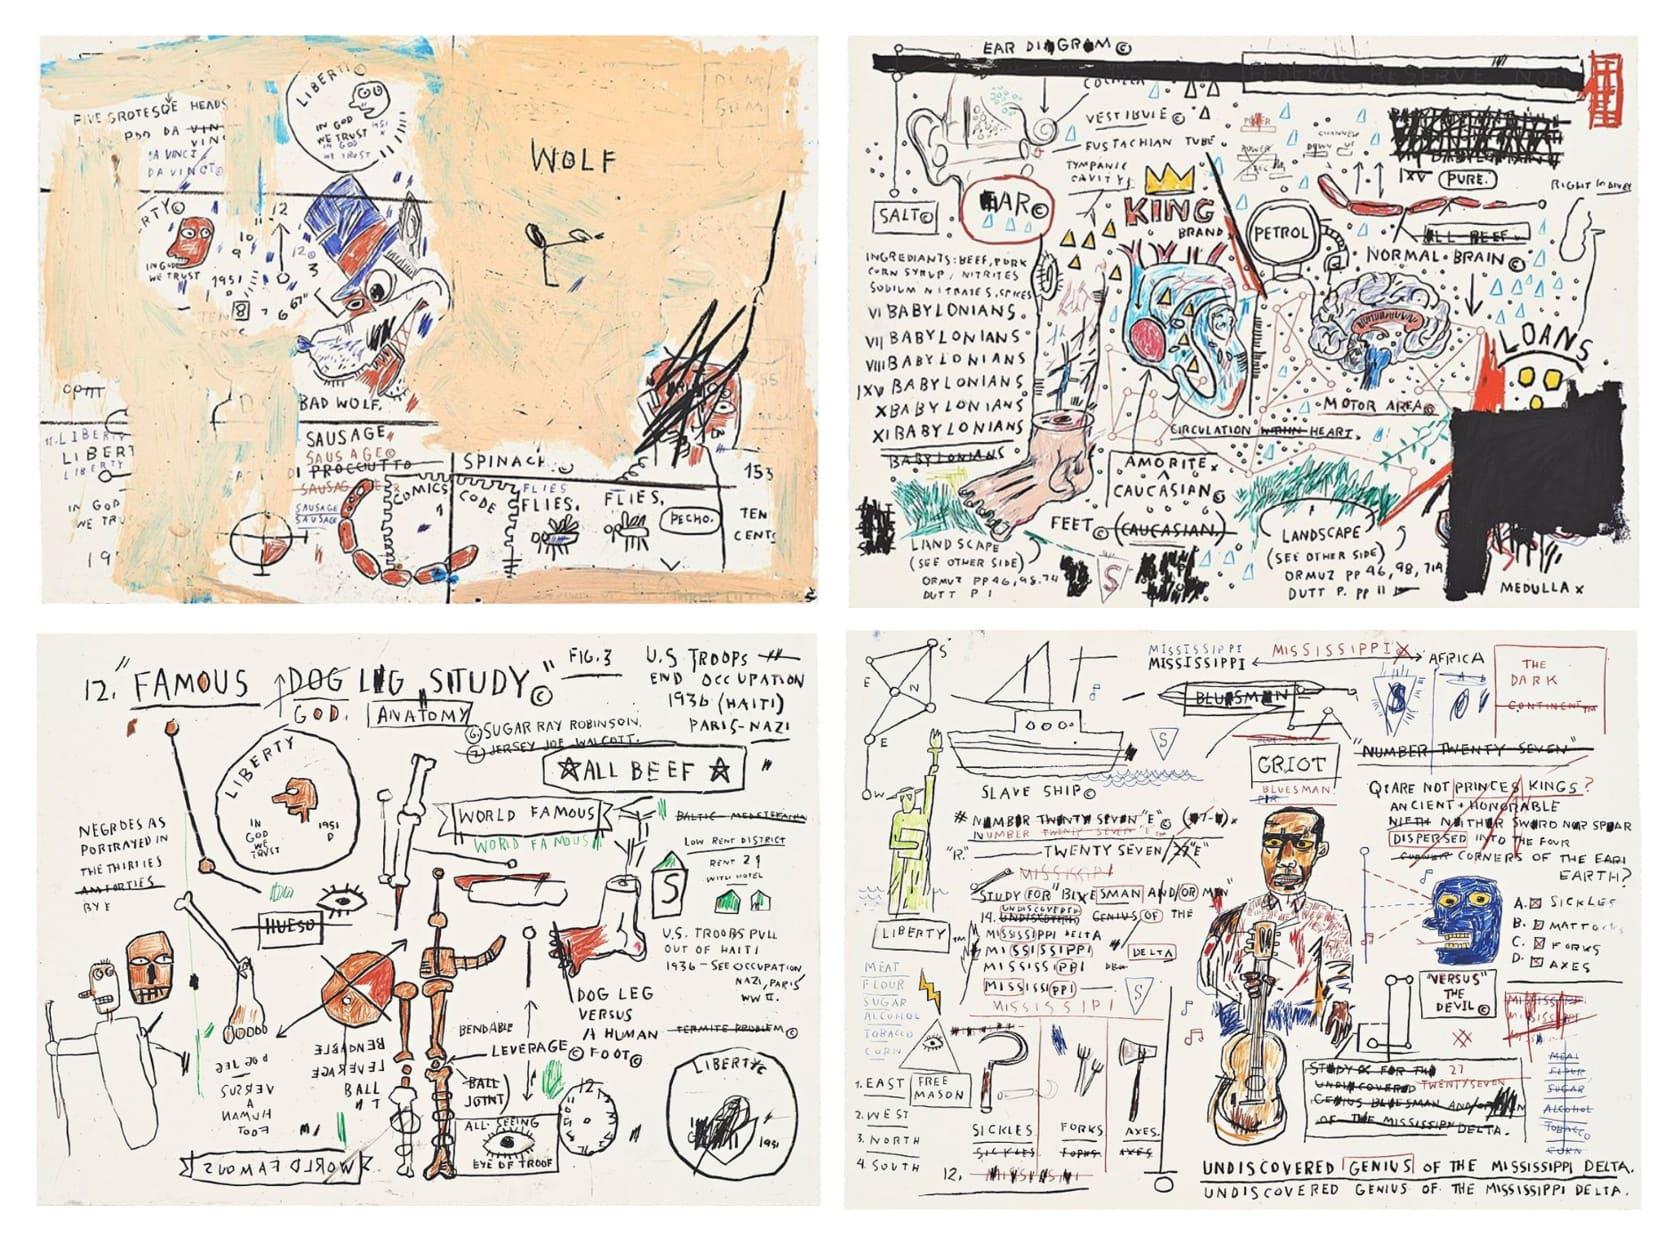 Jean-Michel Basquiat Wolf Sausage, King Brand, Dog Leg Study, Undiscovered Genius Screenprints